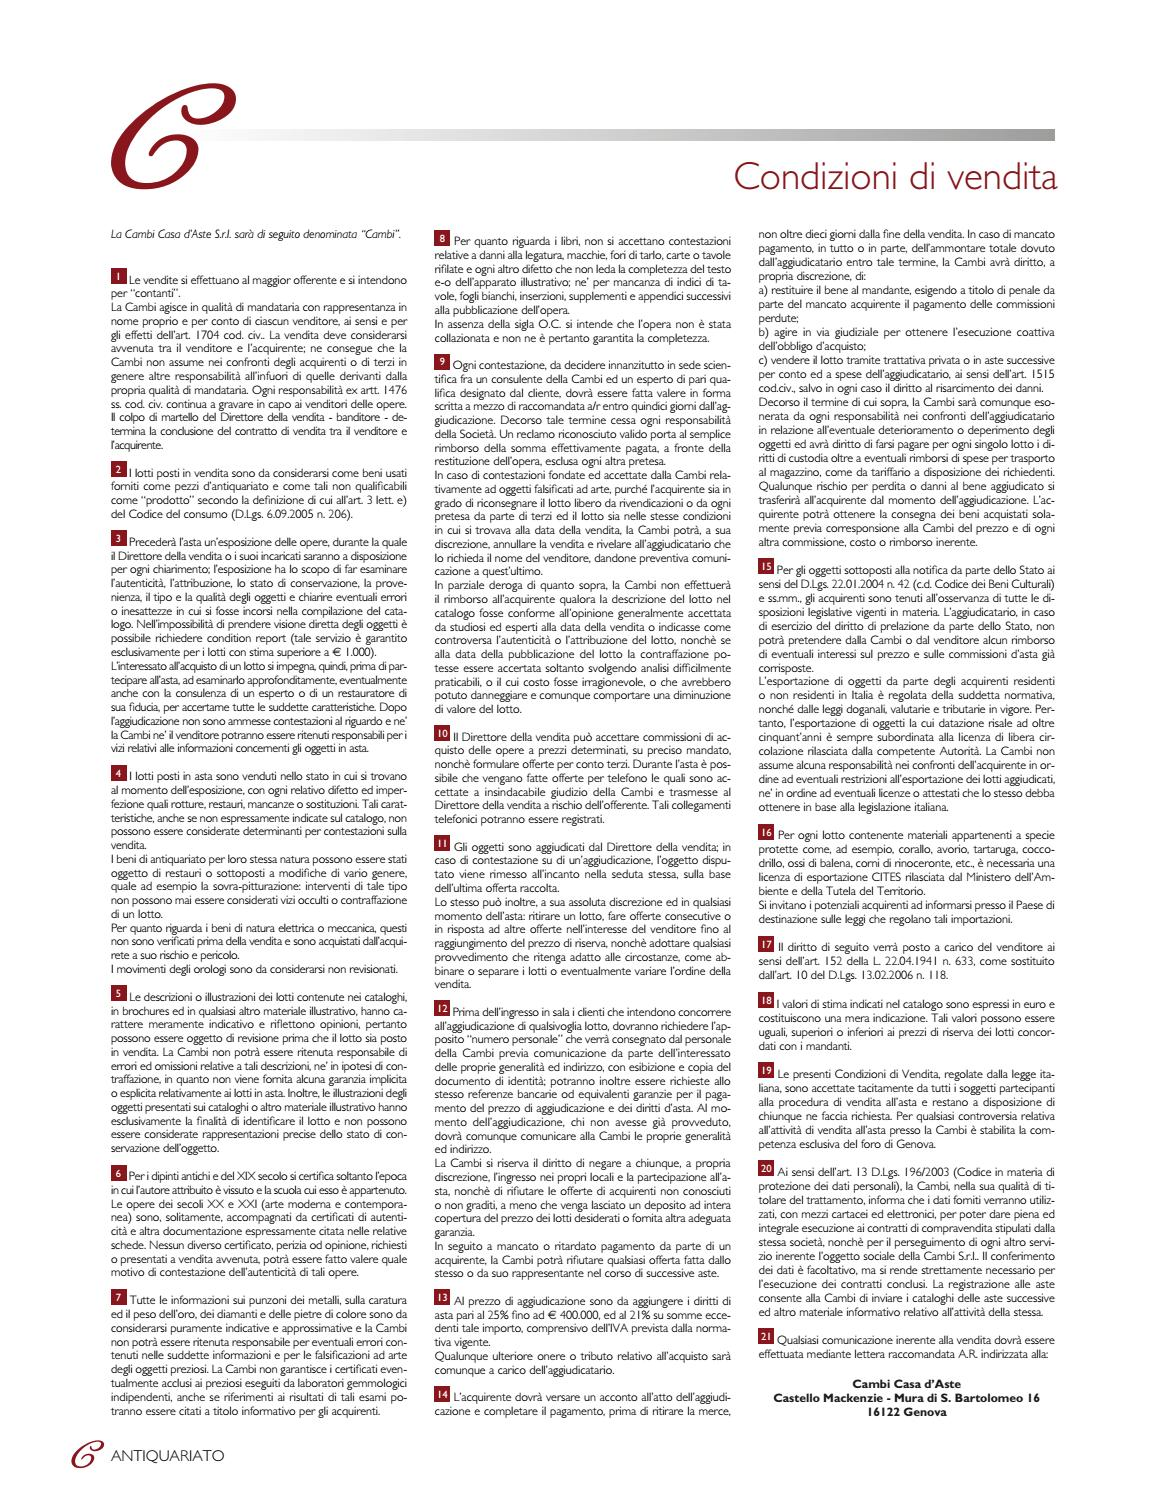 6 leggi di datazione relativa